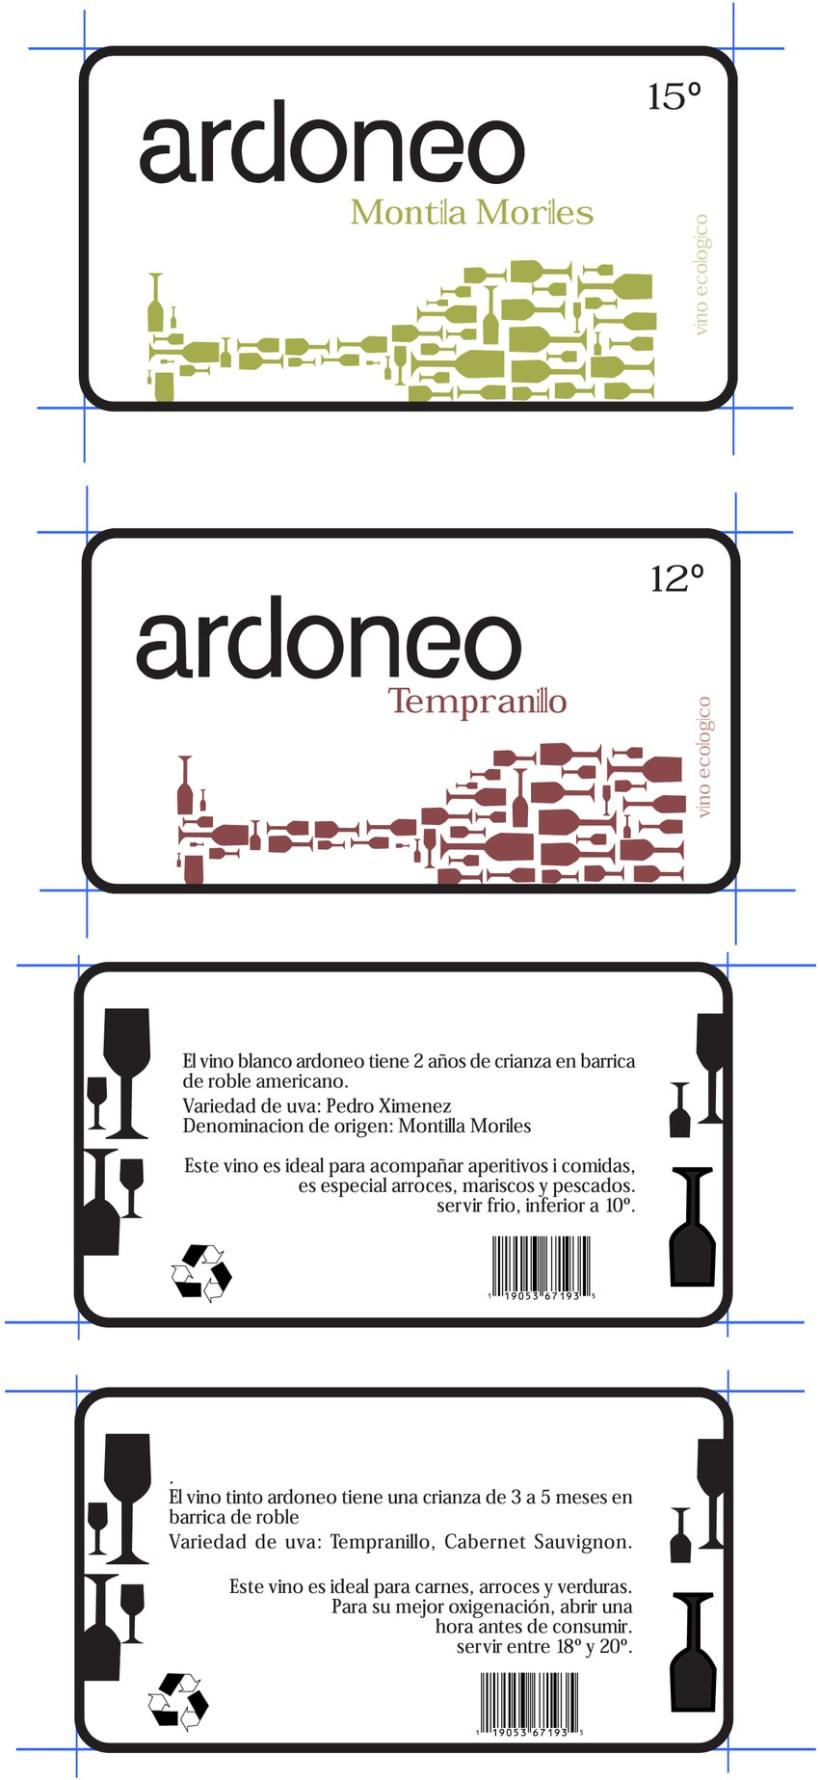 ardoneo 2